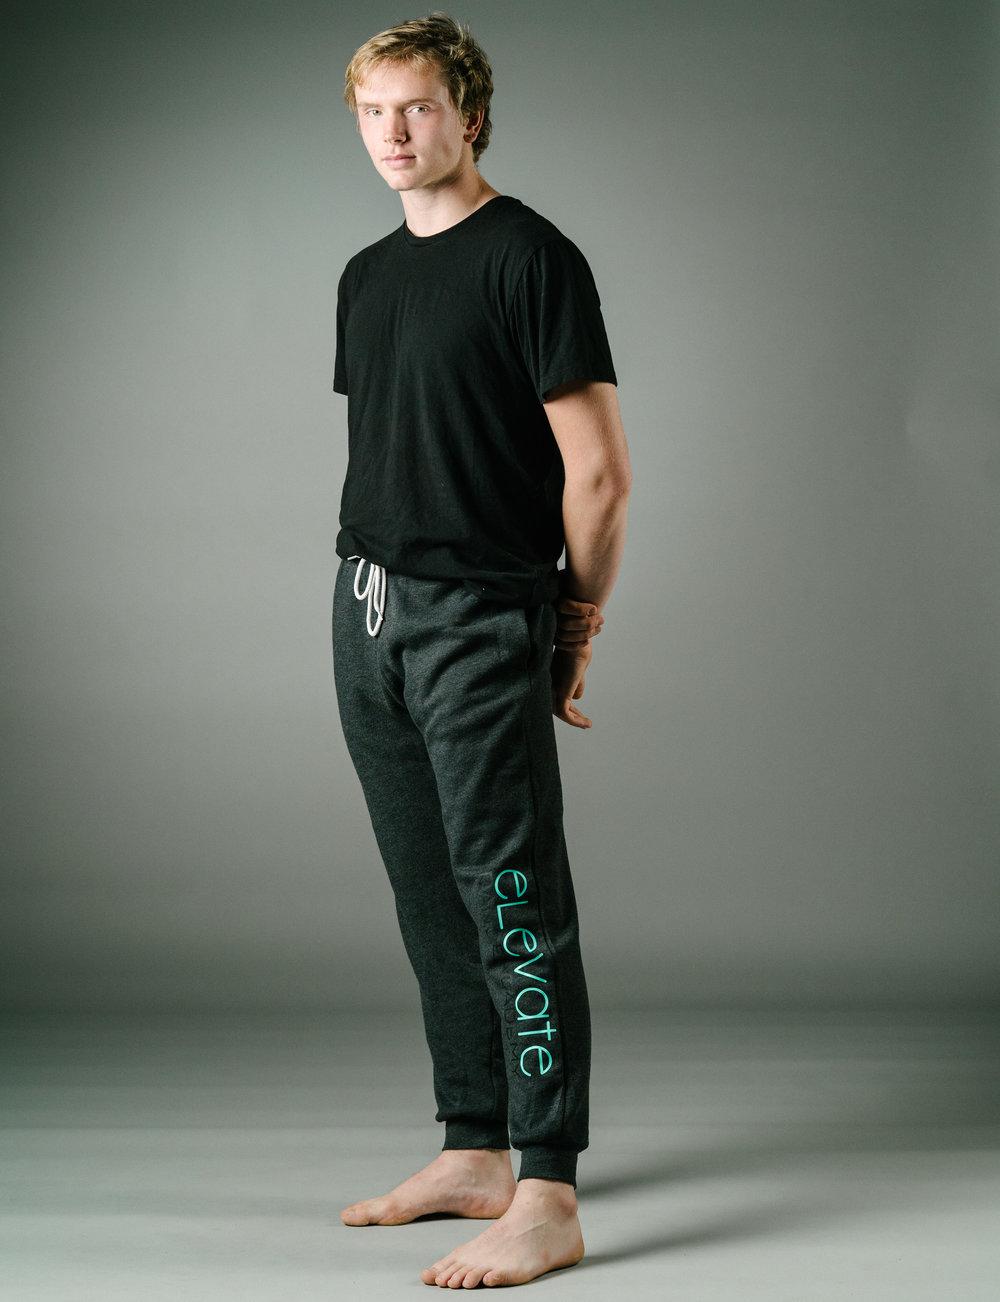 Sweatpants (Elevate down the leg)